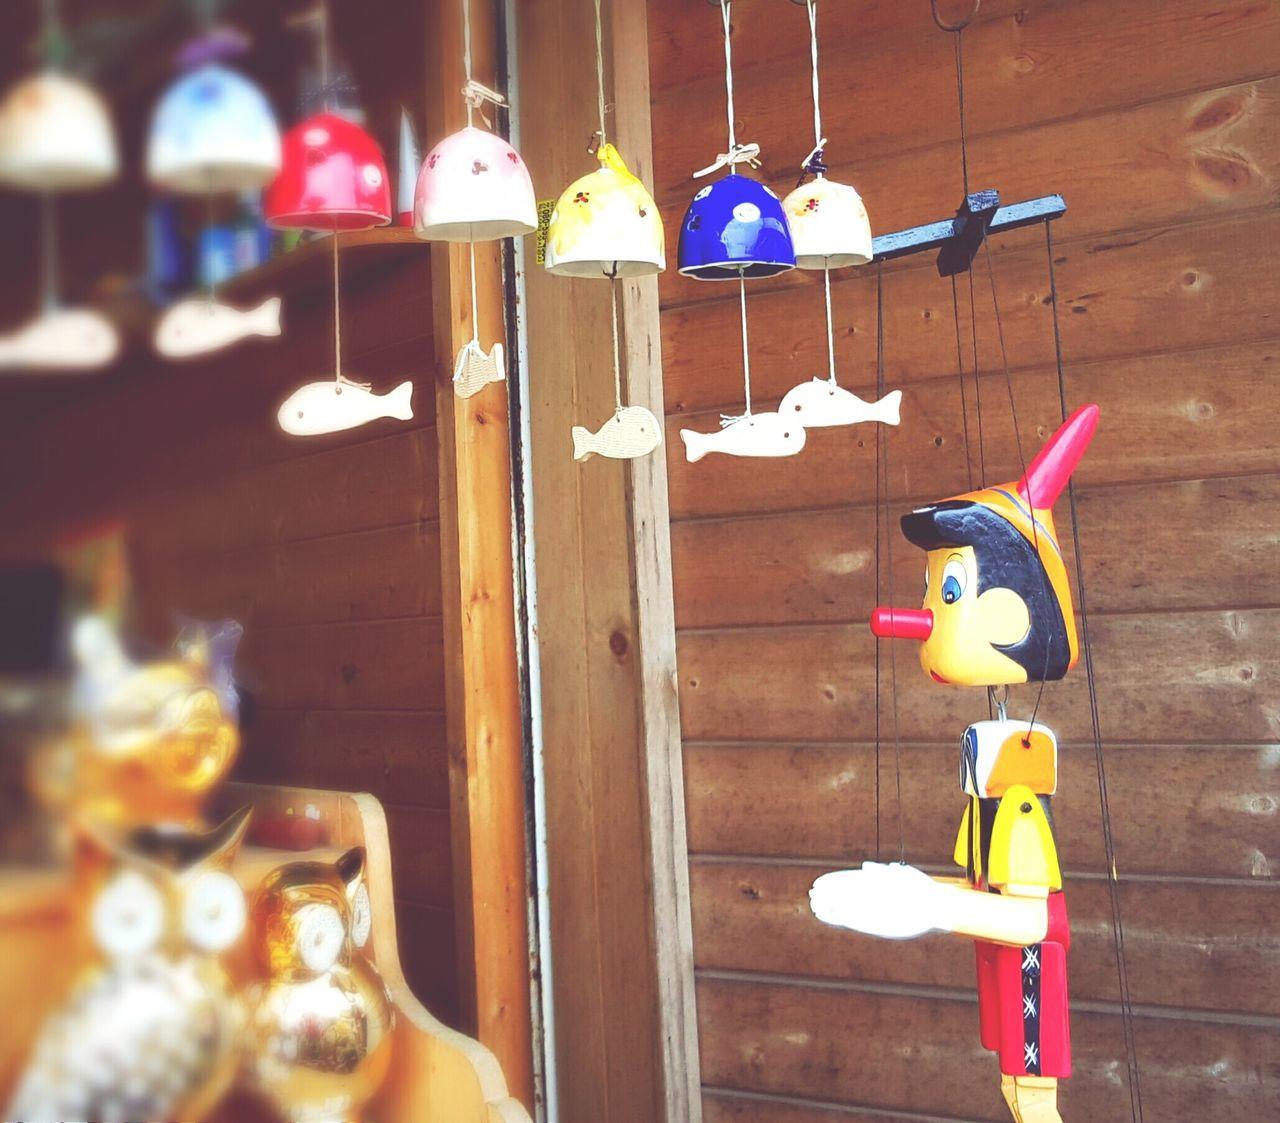 Pinochio Busan,Korea Traveling Lieblingsteil